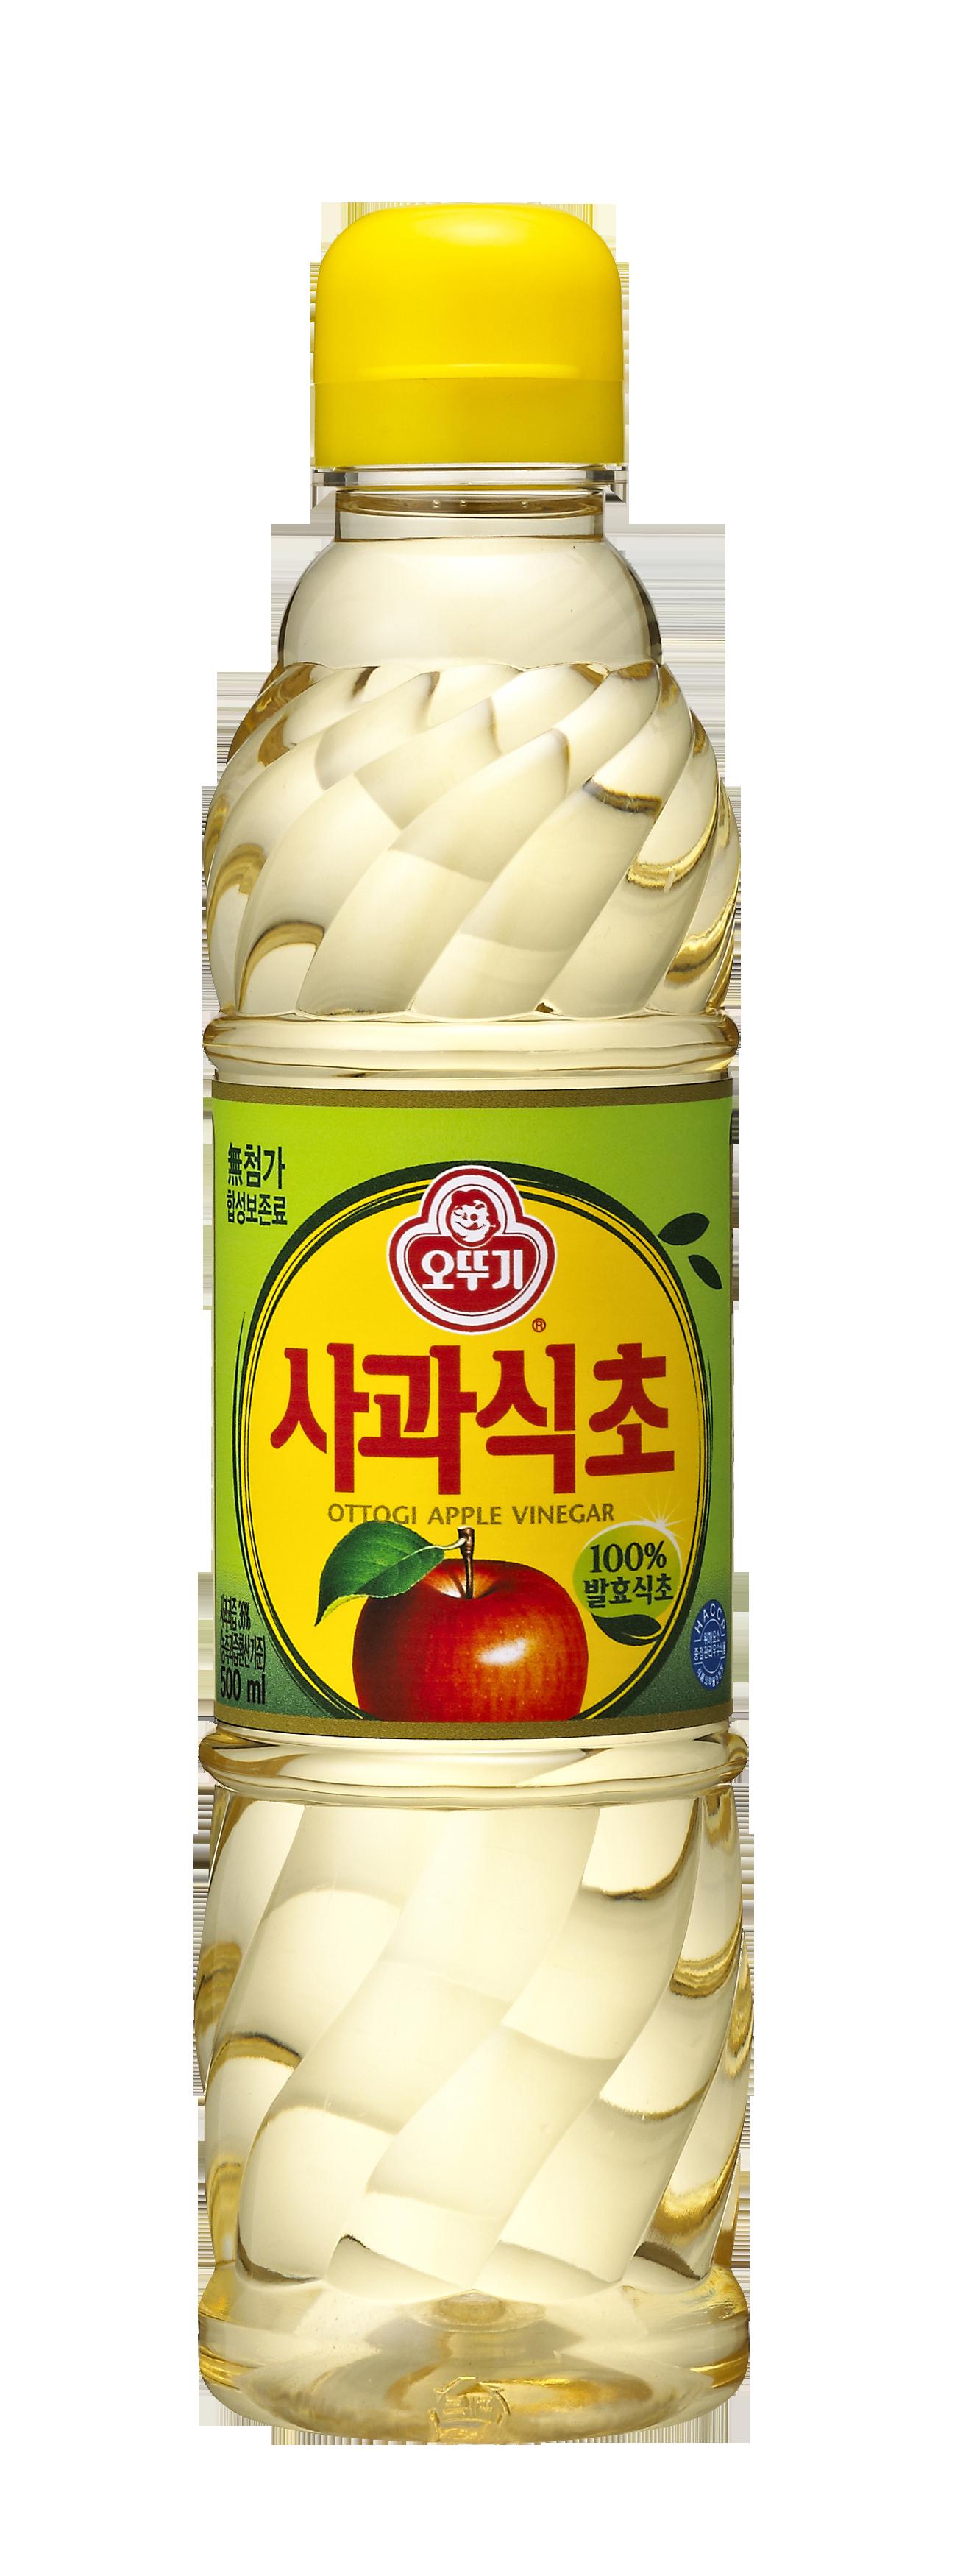 Vinaigre de pomme, Ottogi (500 ml)